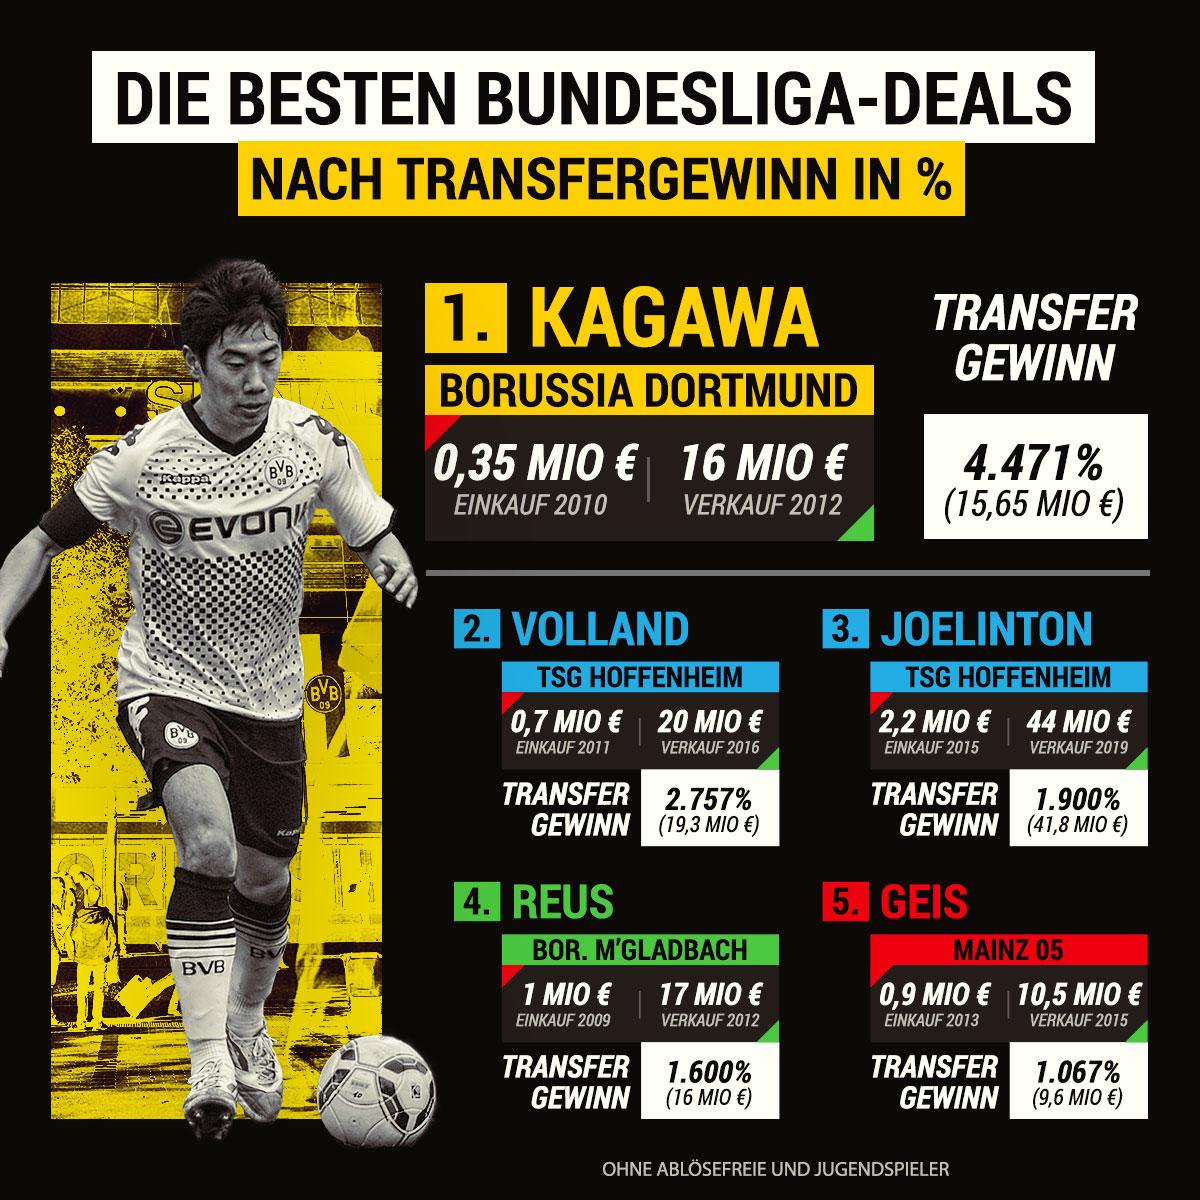 Beste Transfer-Deals Bundesliga prozentual